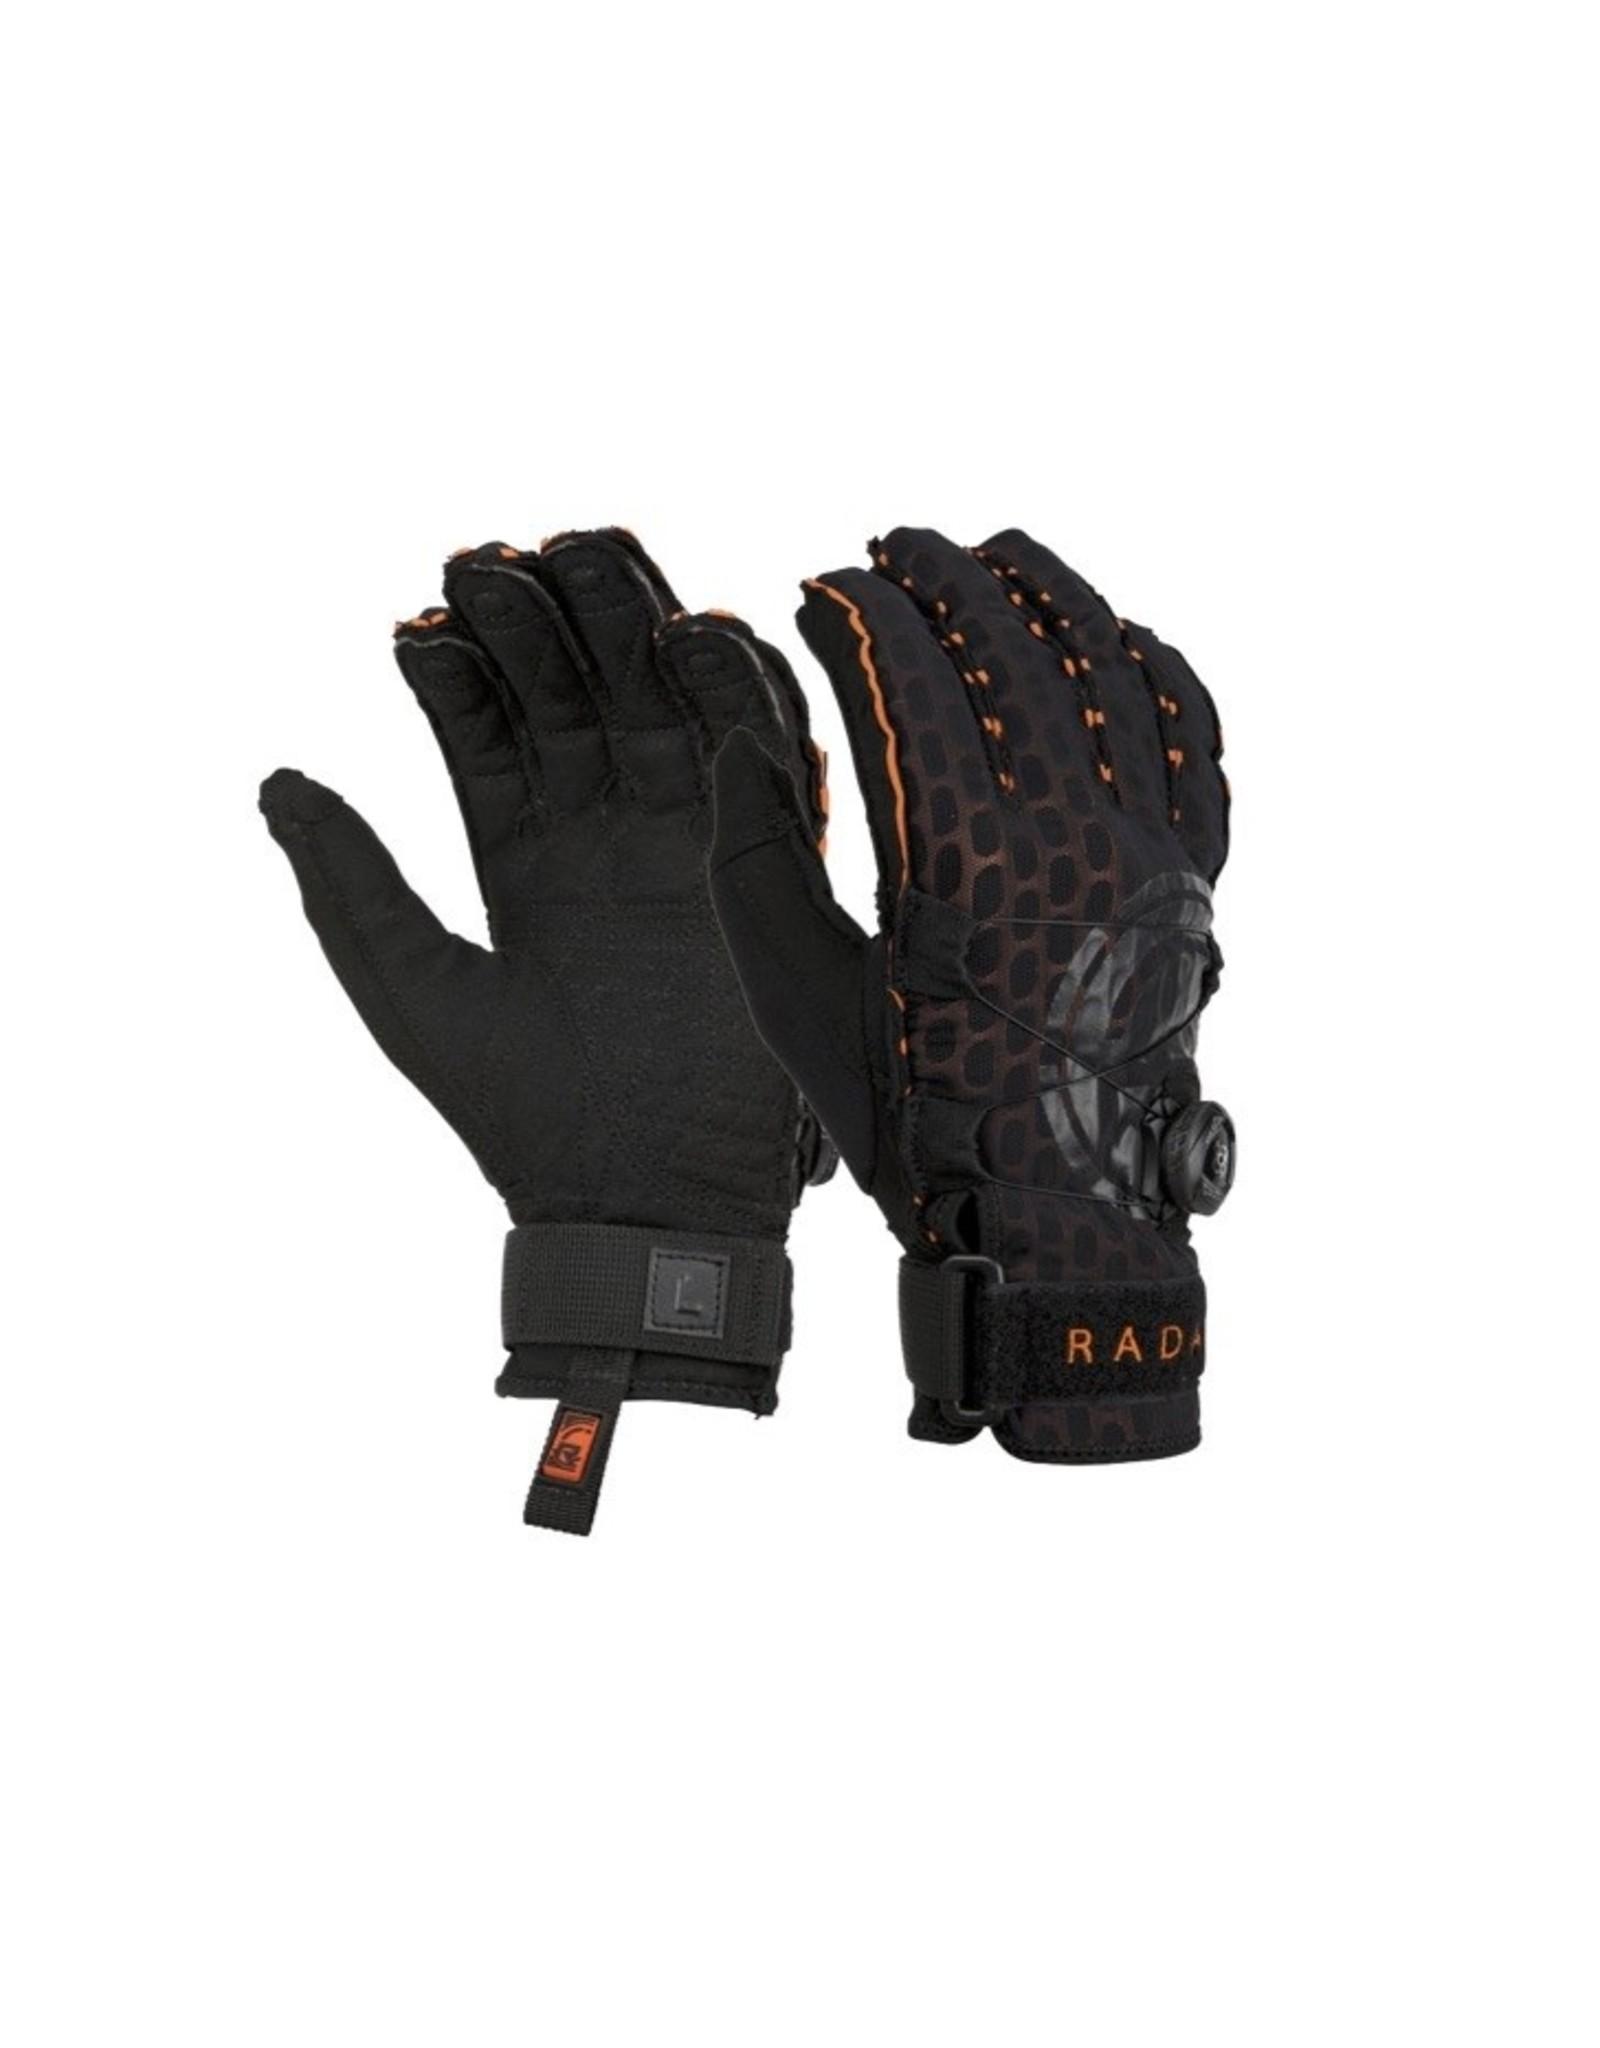 Radar Vapor A BOA Inside-Out Glove